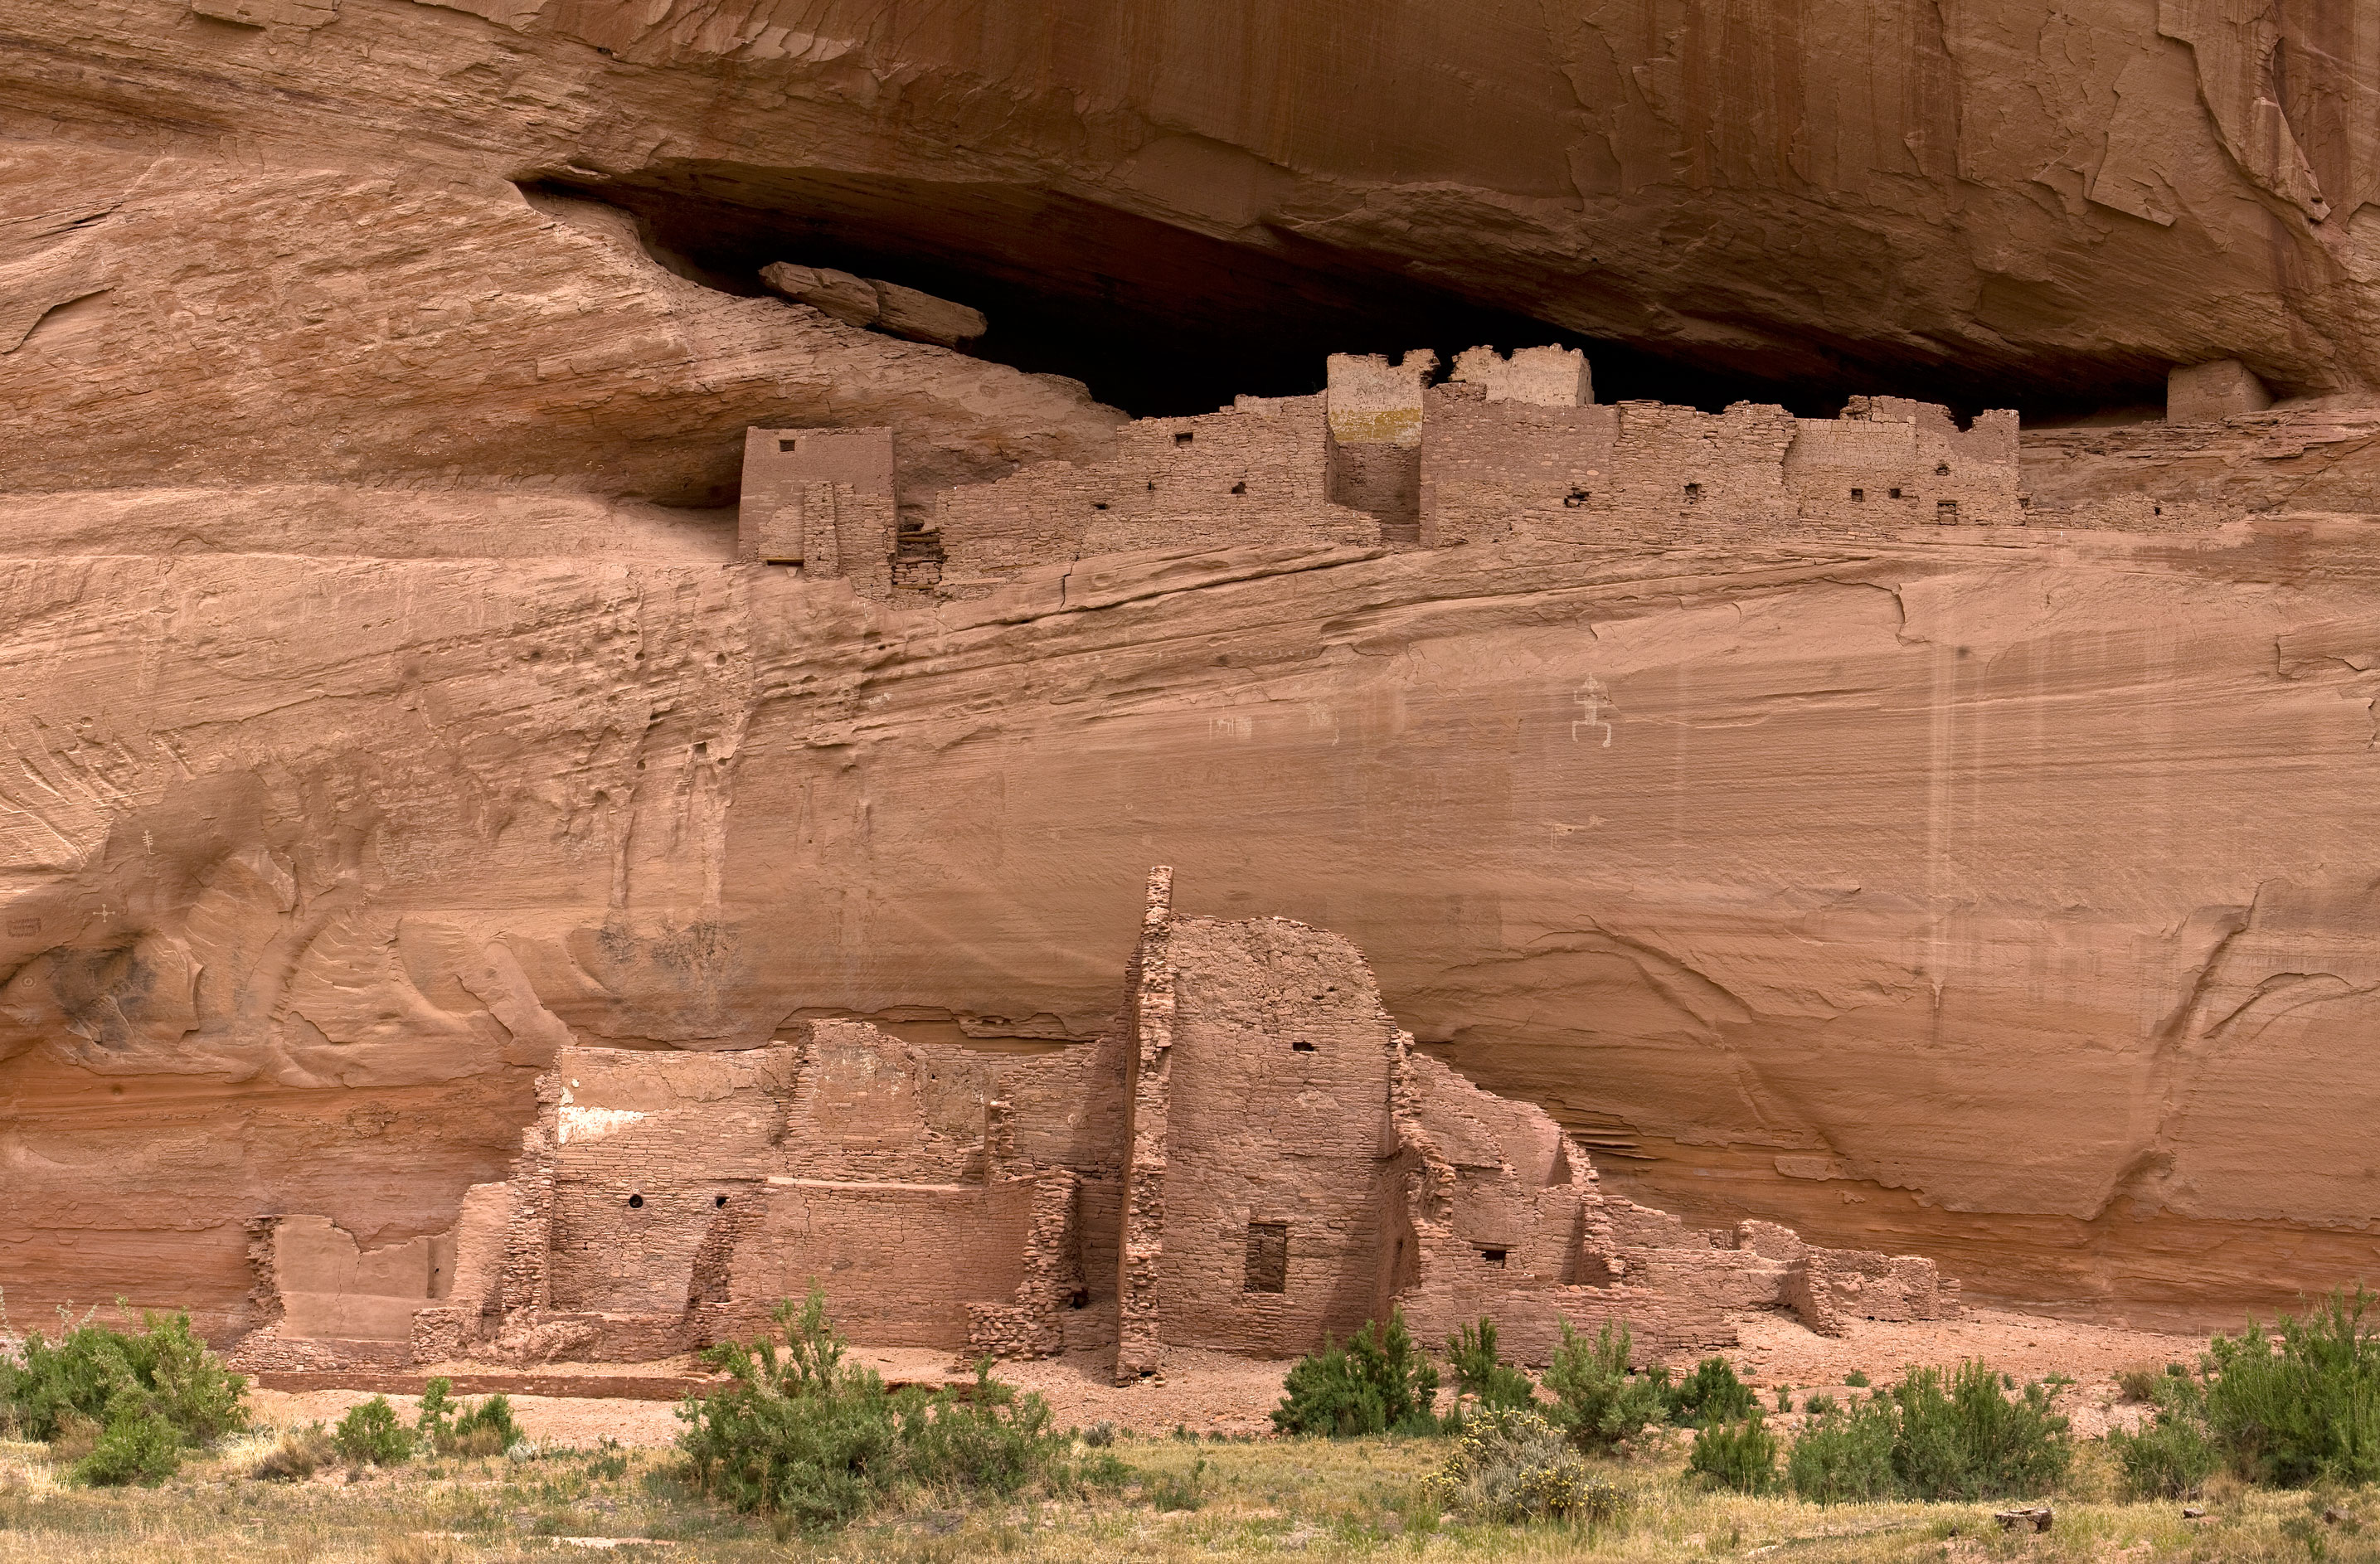 heaven aka navajo nation canyon de chelly national monument